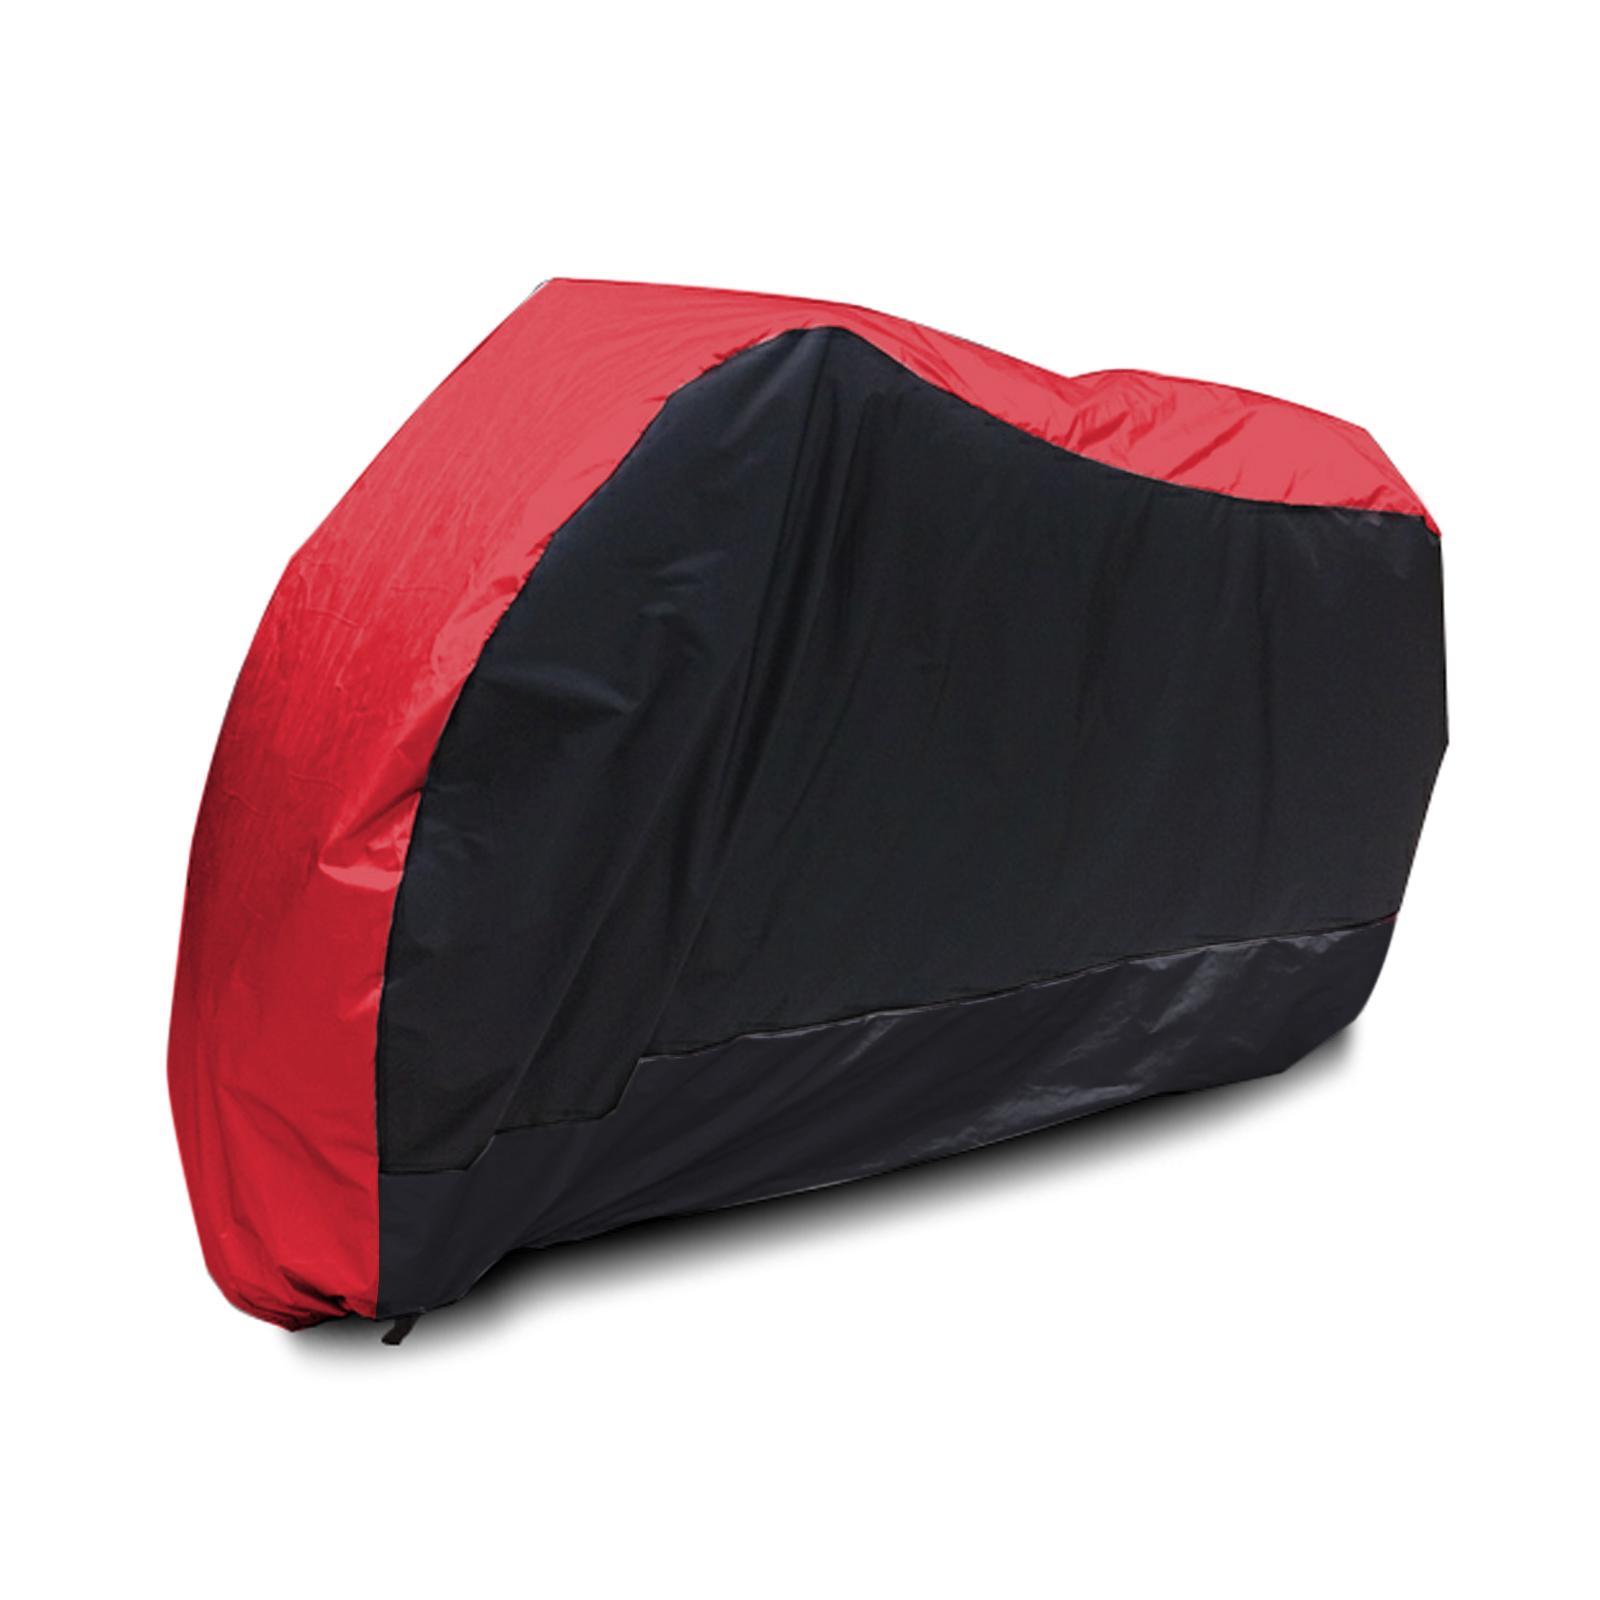 Book Cover Black Xl : Waterproof motor bike cover for cruiser sports bikes red